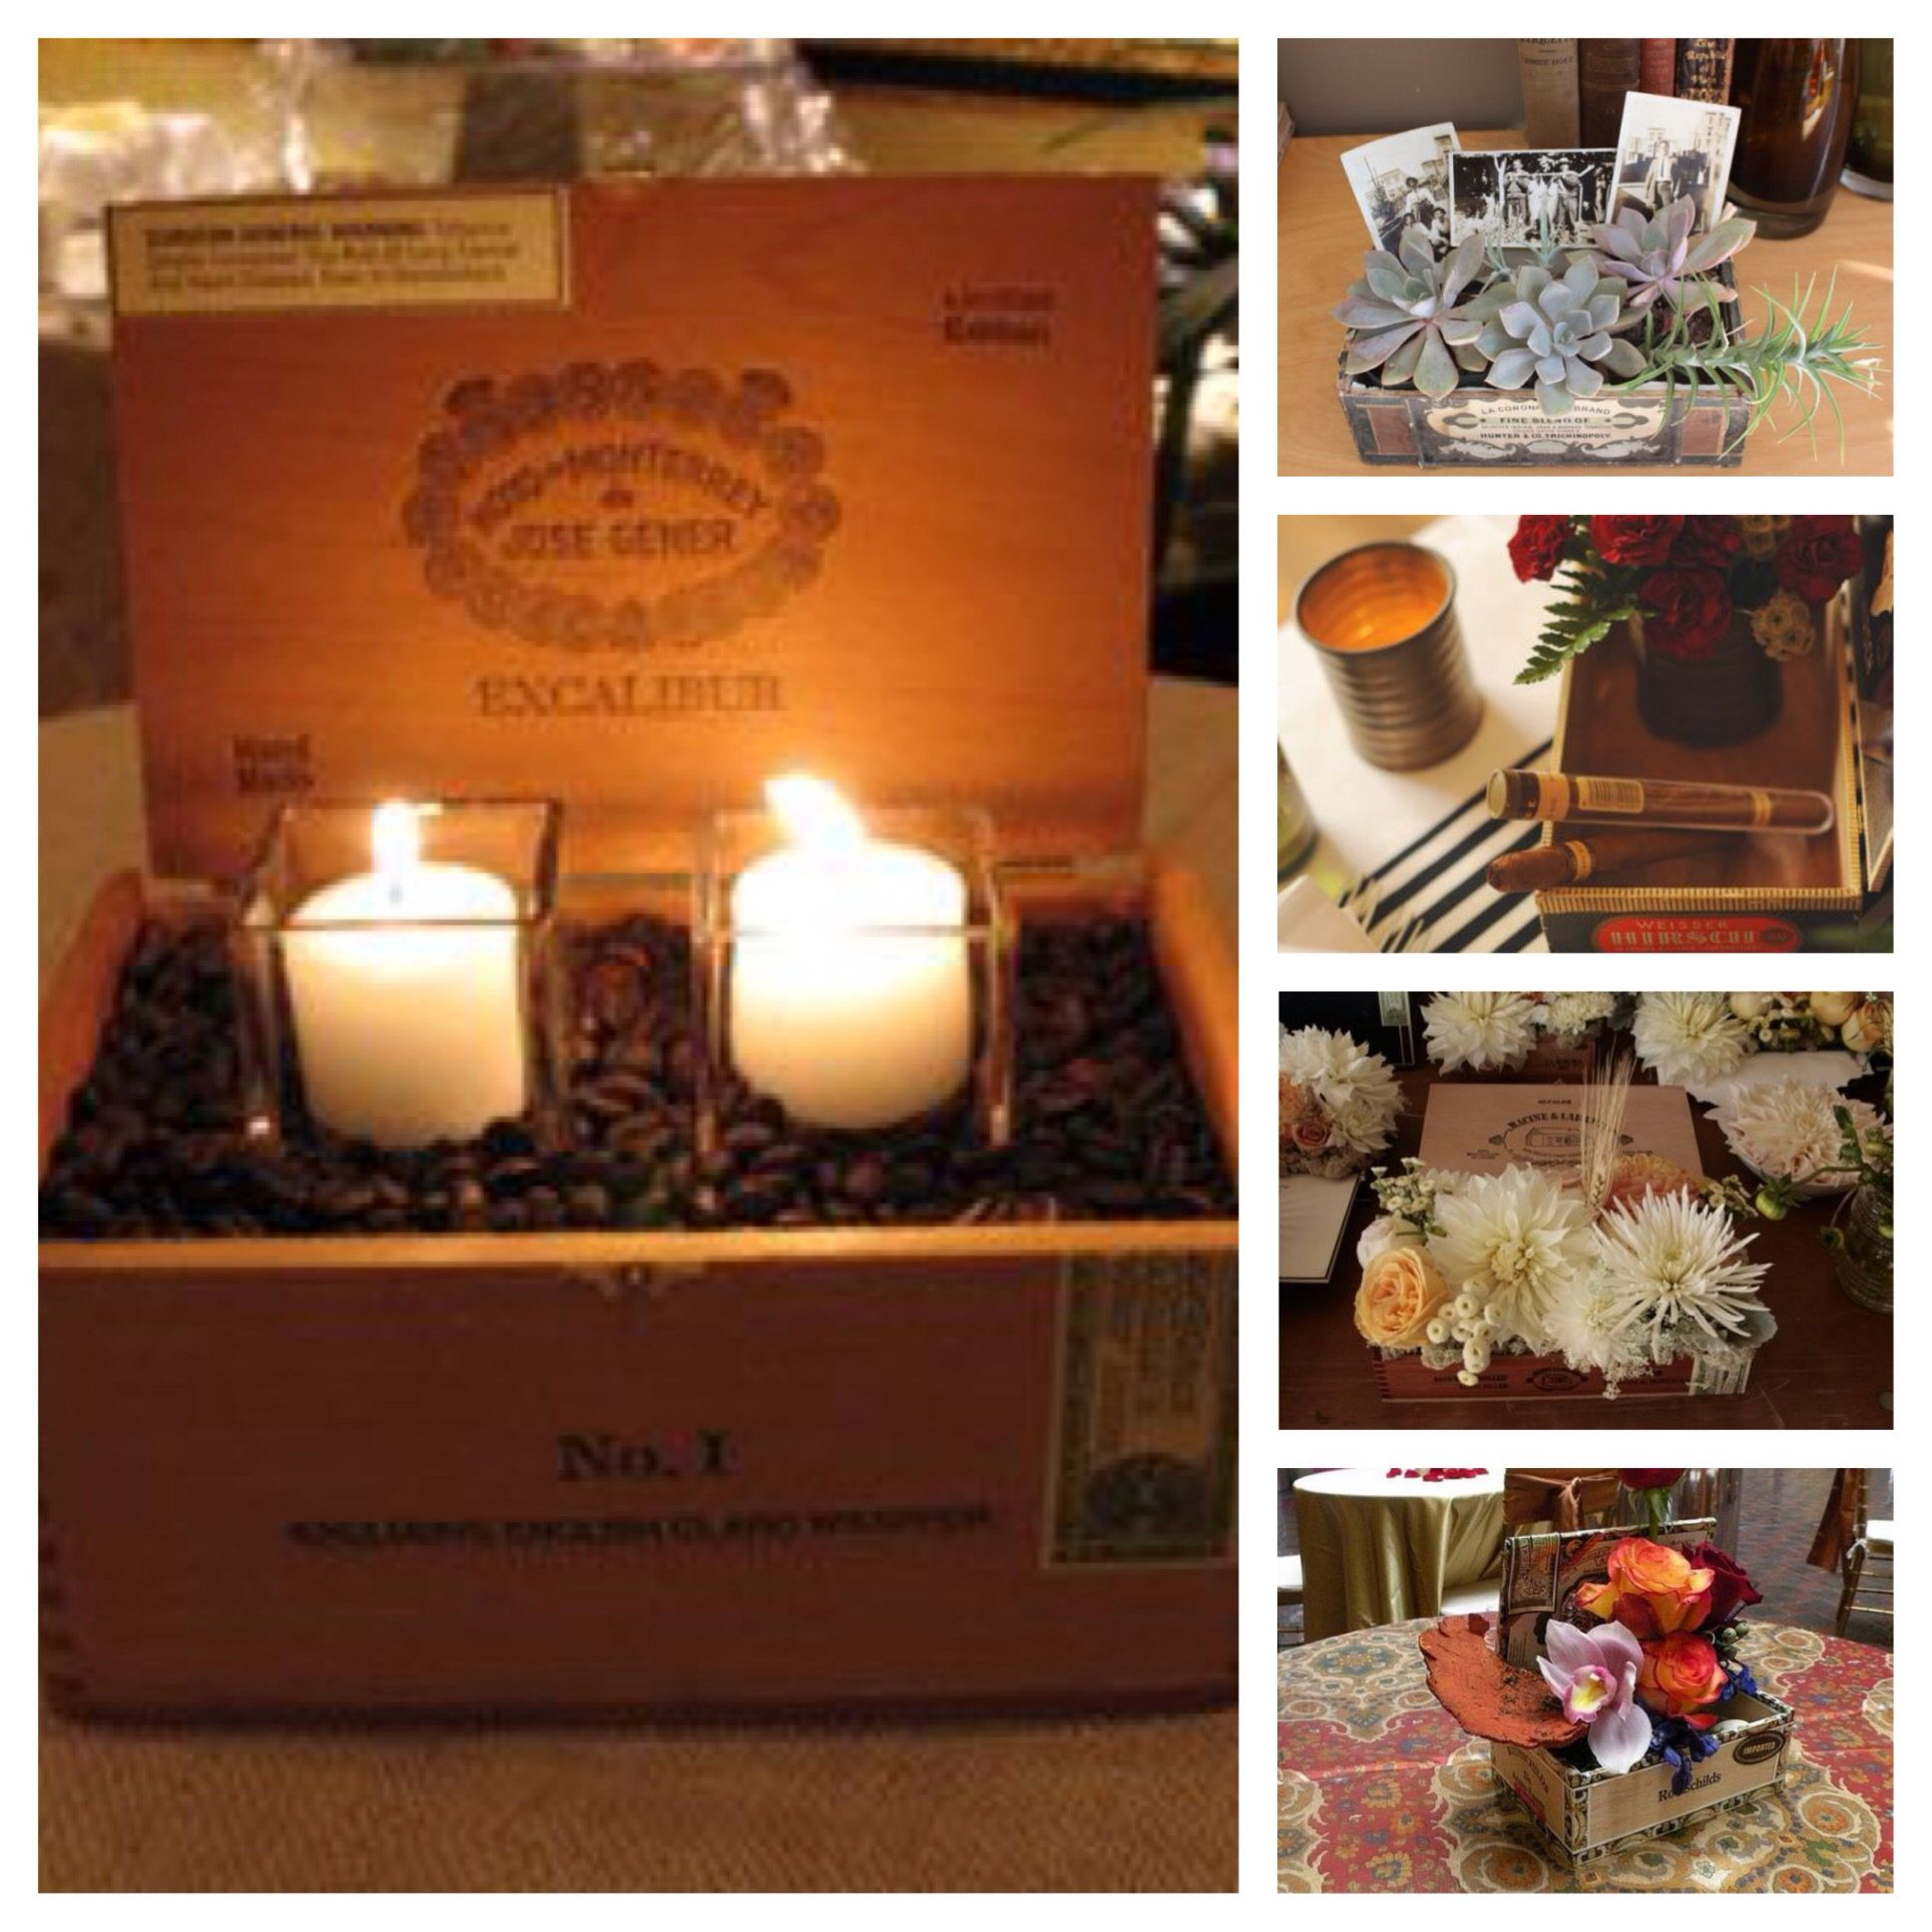 Night wedding decor ideas  cigar box centerpieces  uus havana nights wedding decor ideas